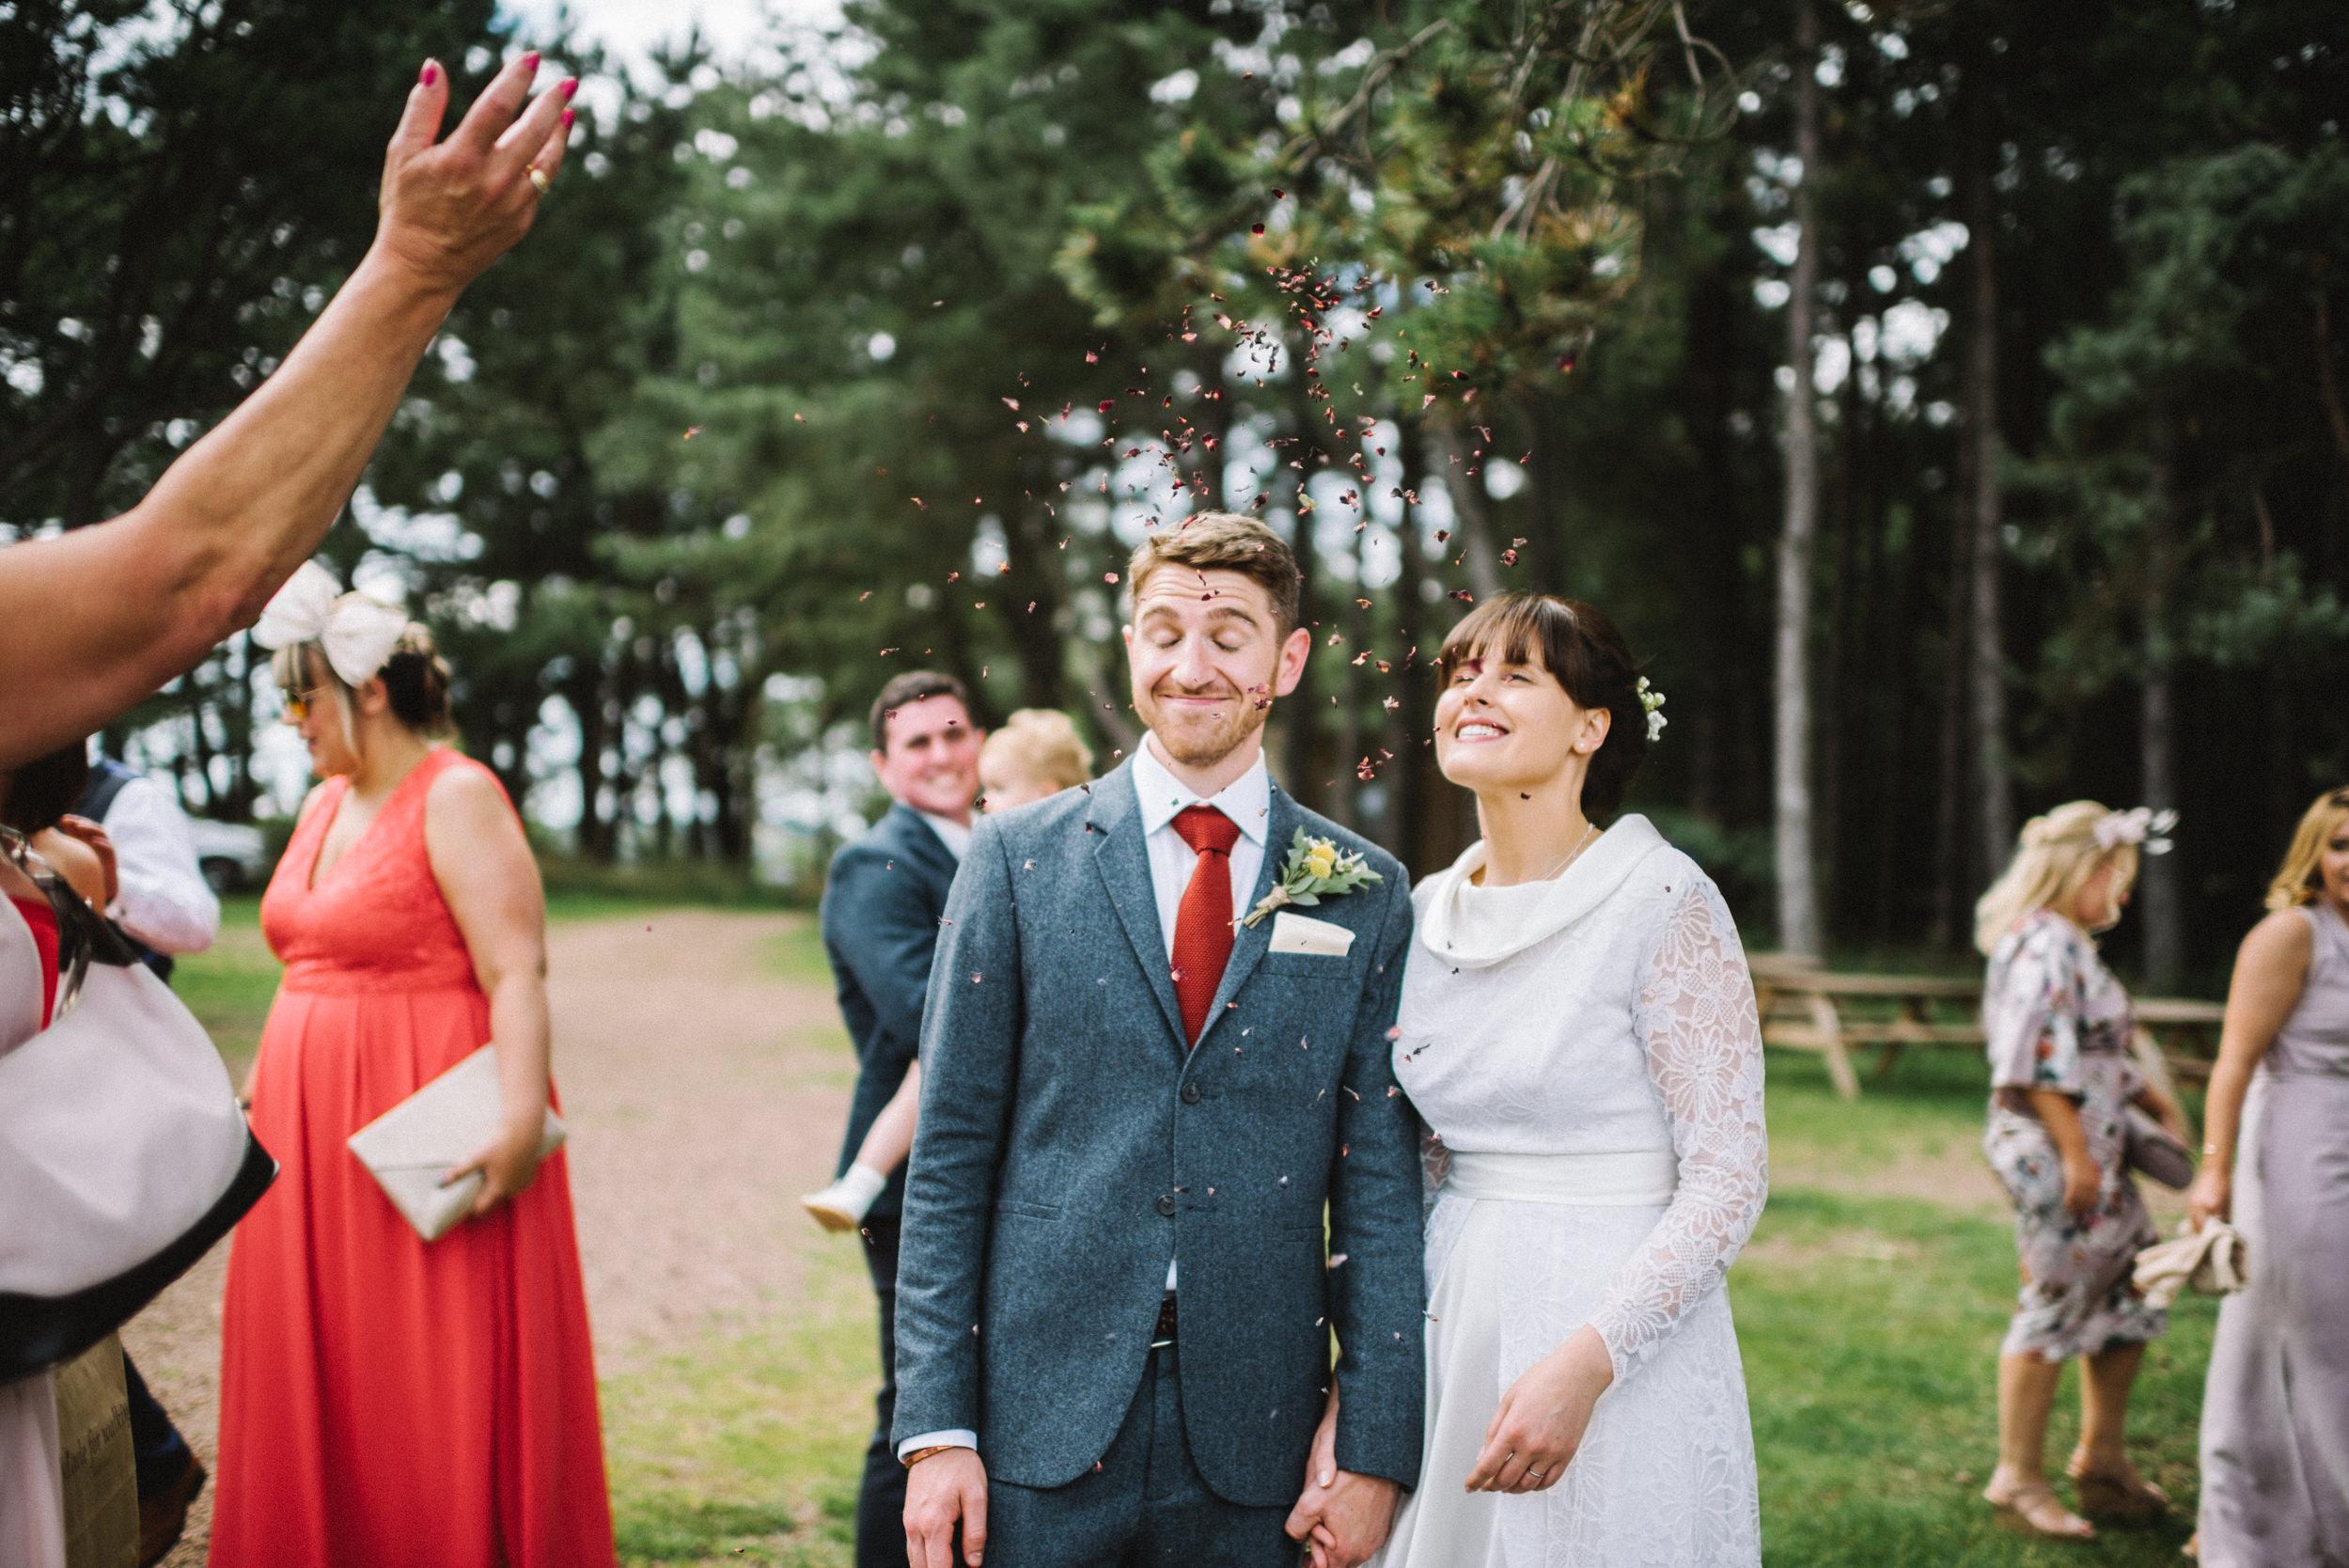 0042-alternative-wedding-portrait-family-kids-photographer-glasgow-scotland.JPG